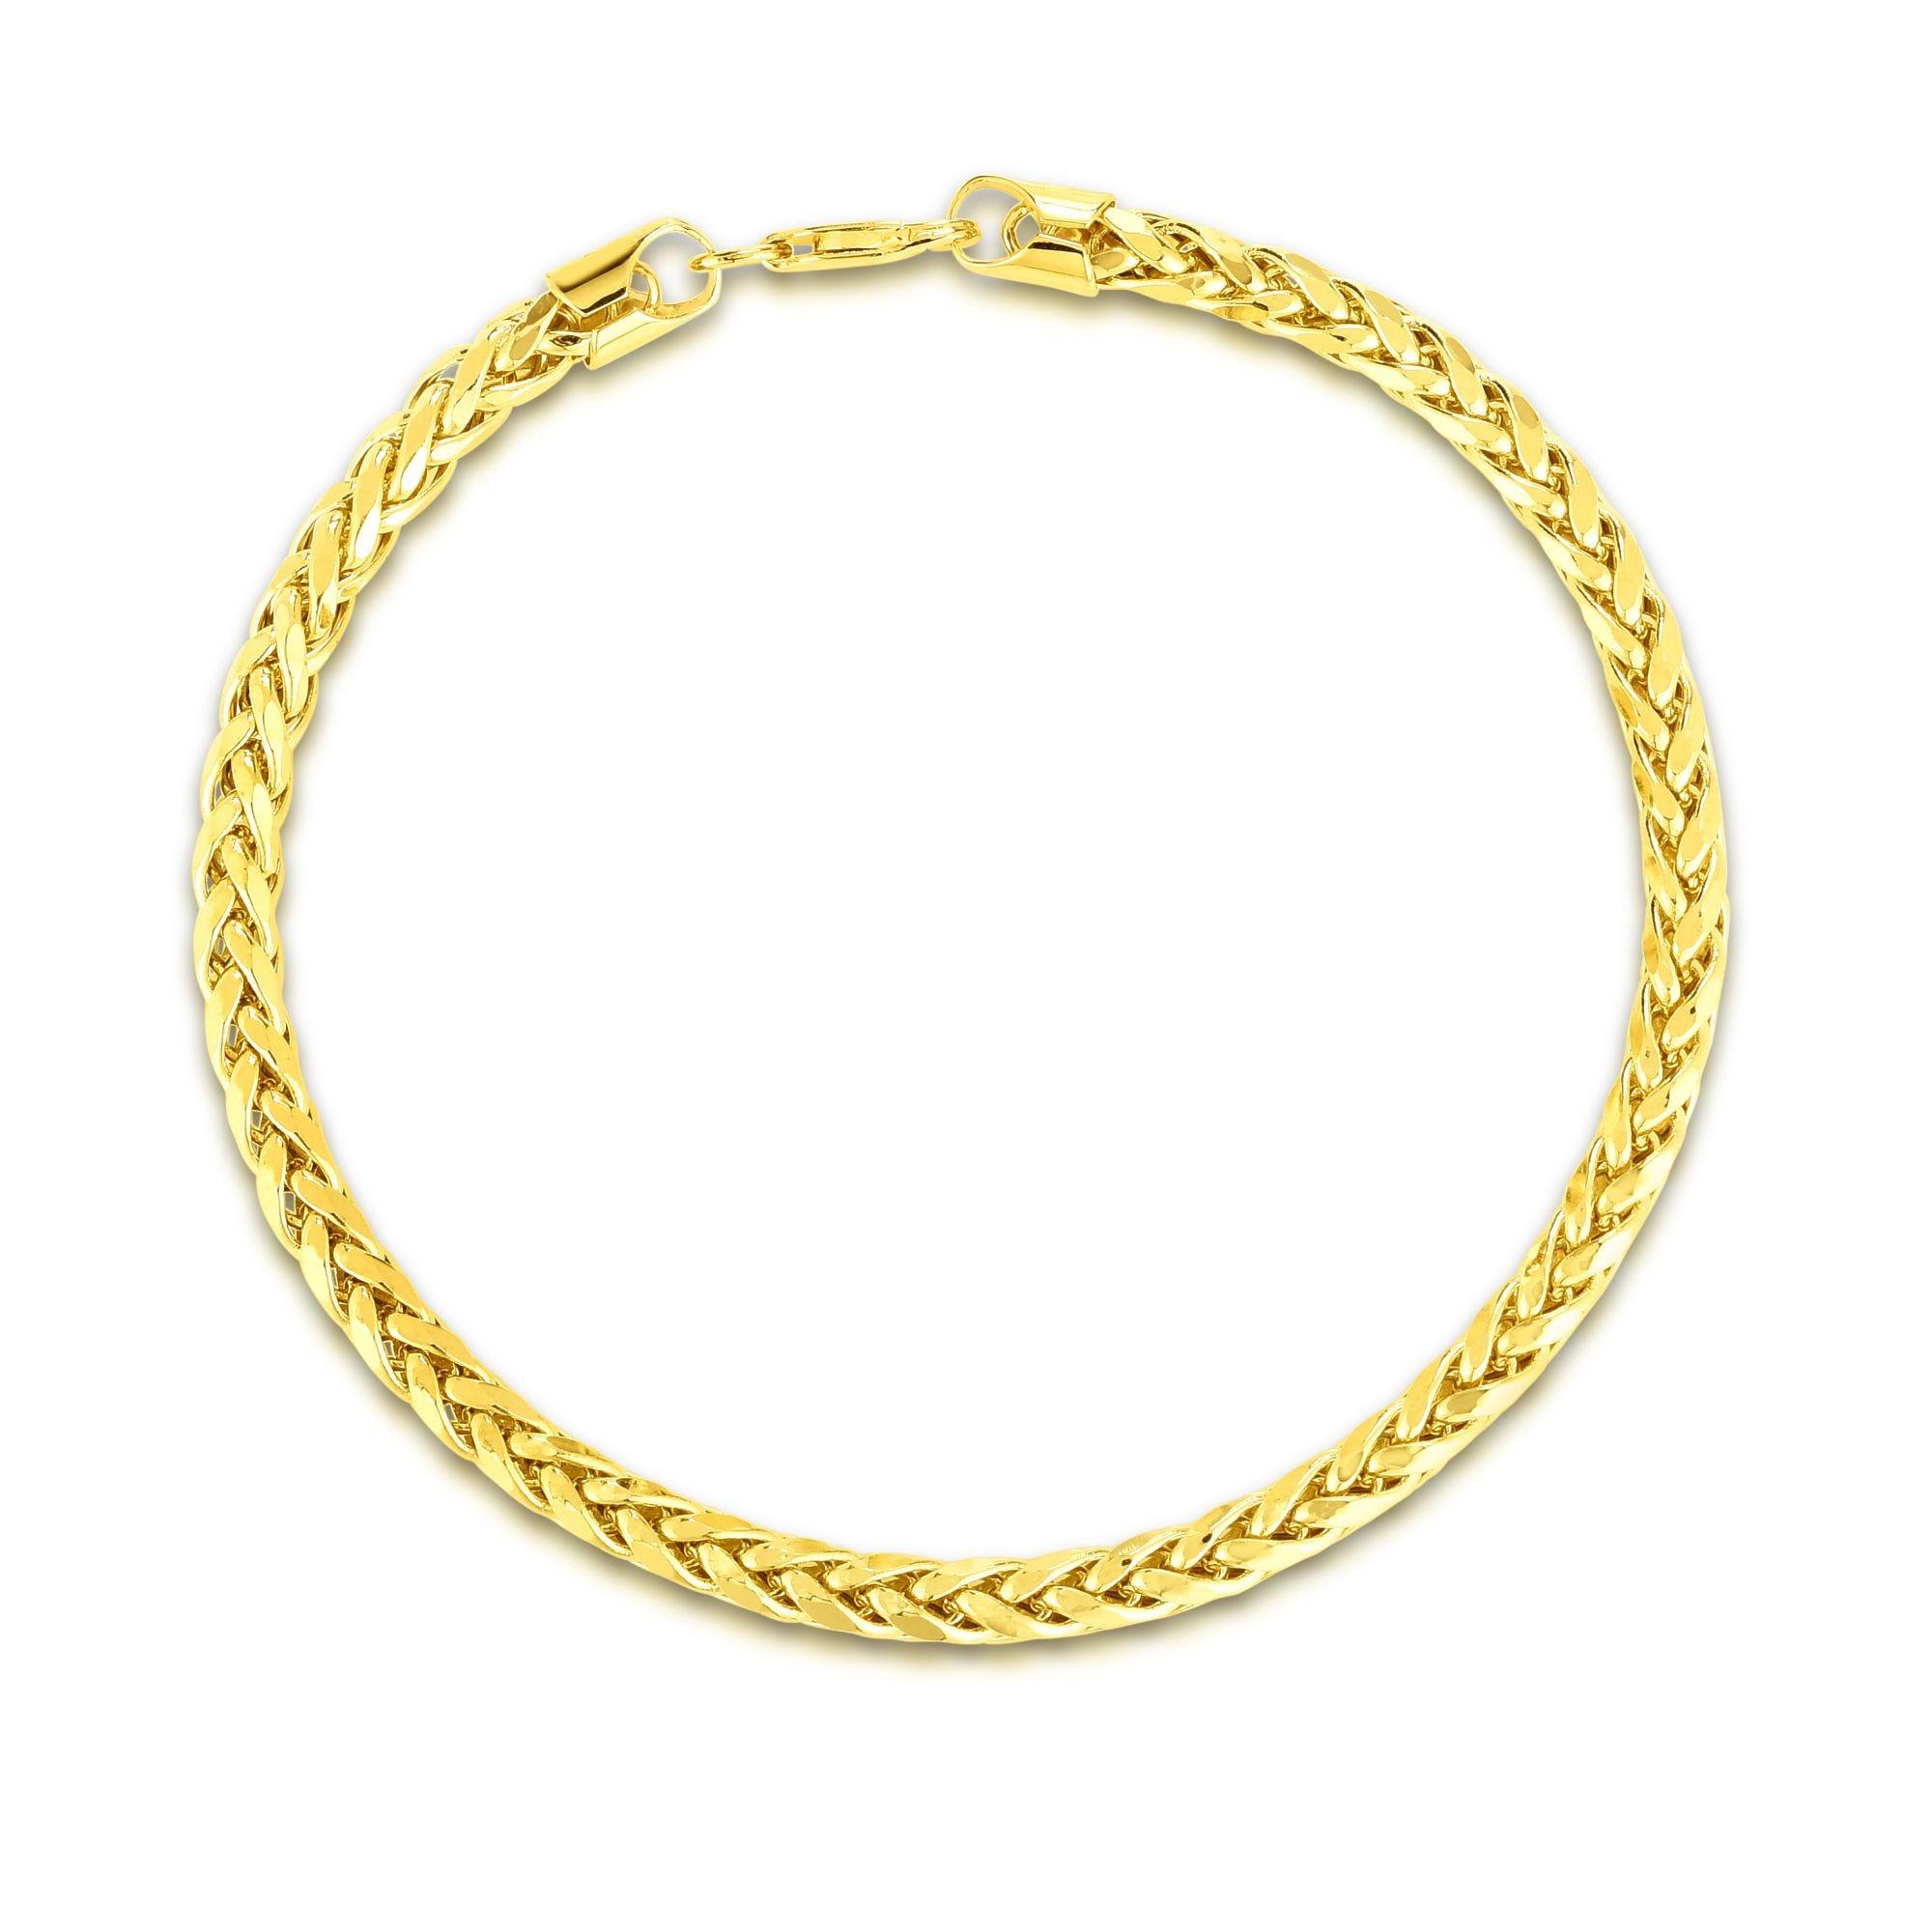 Men's Diamond-Cut Lite Franco Bracelet in 14k Yellow Gold